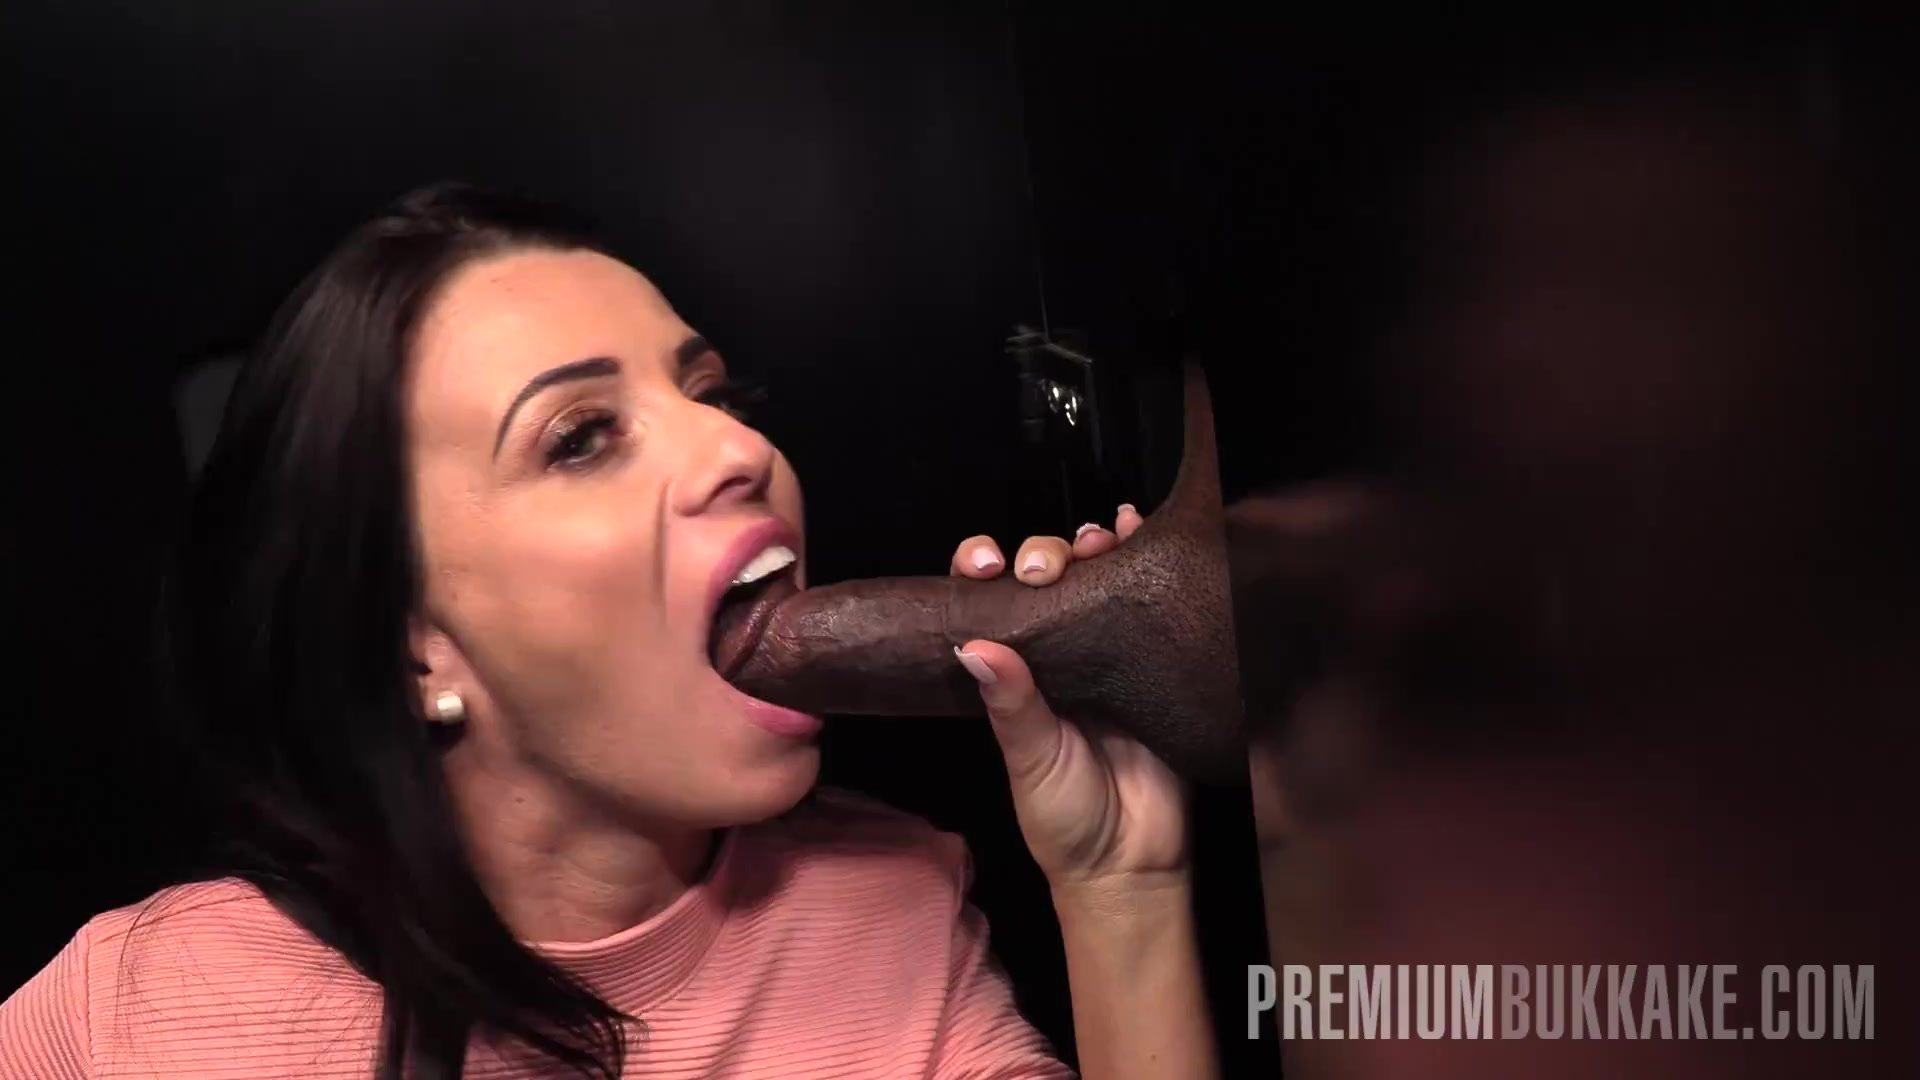 Premium Bukkake - Vicky Love swallows 25 cum loads in a gloryhole box